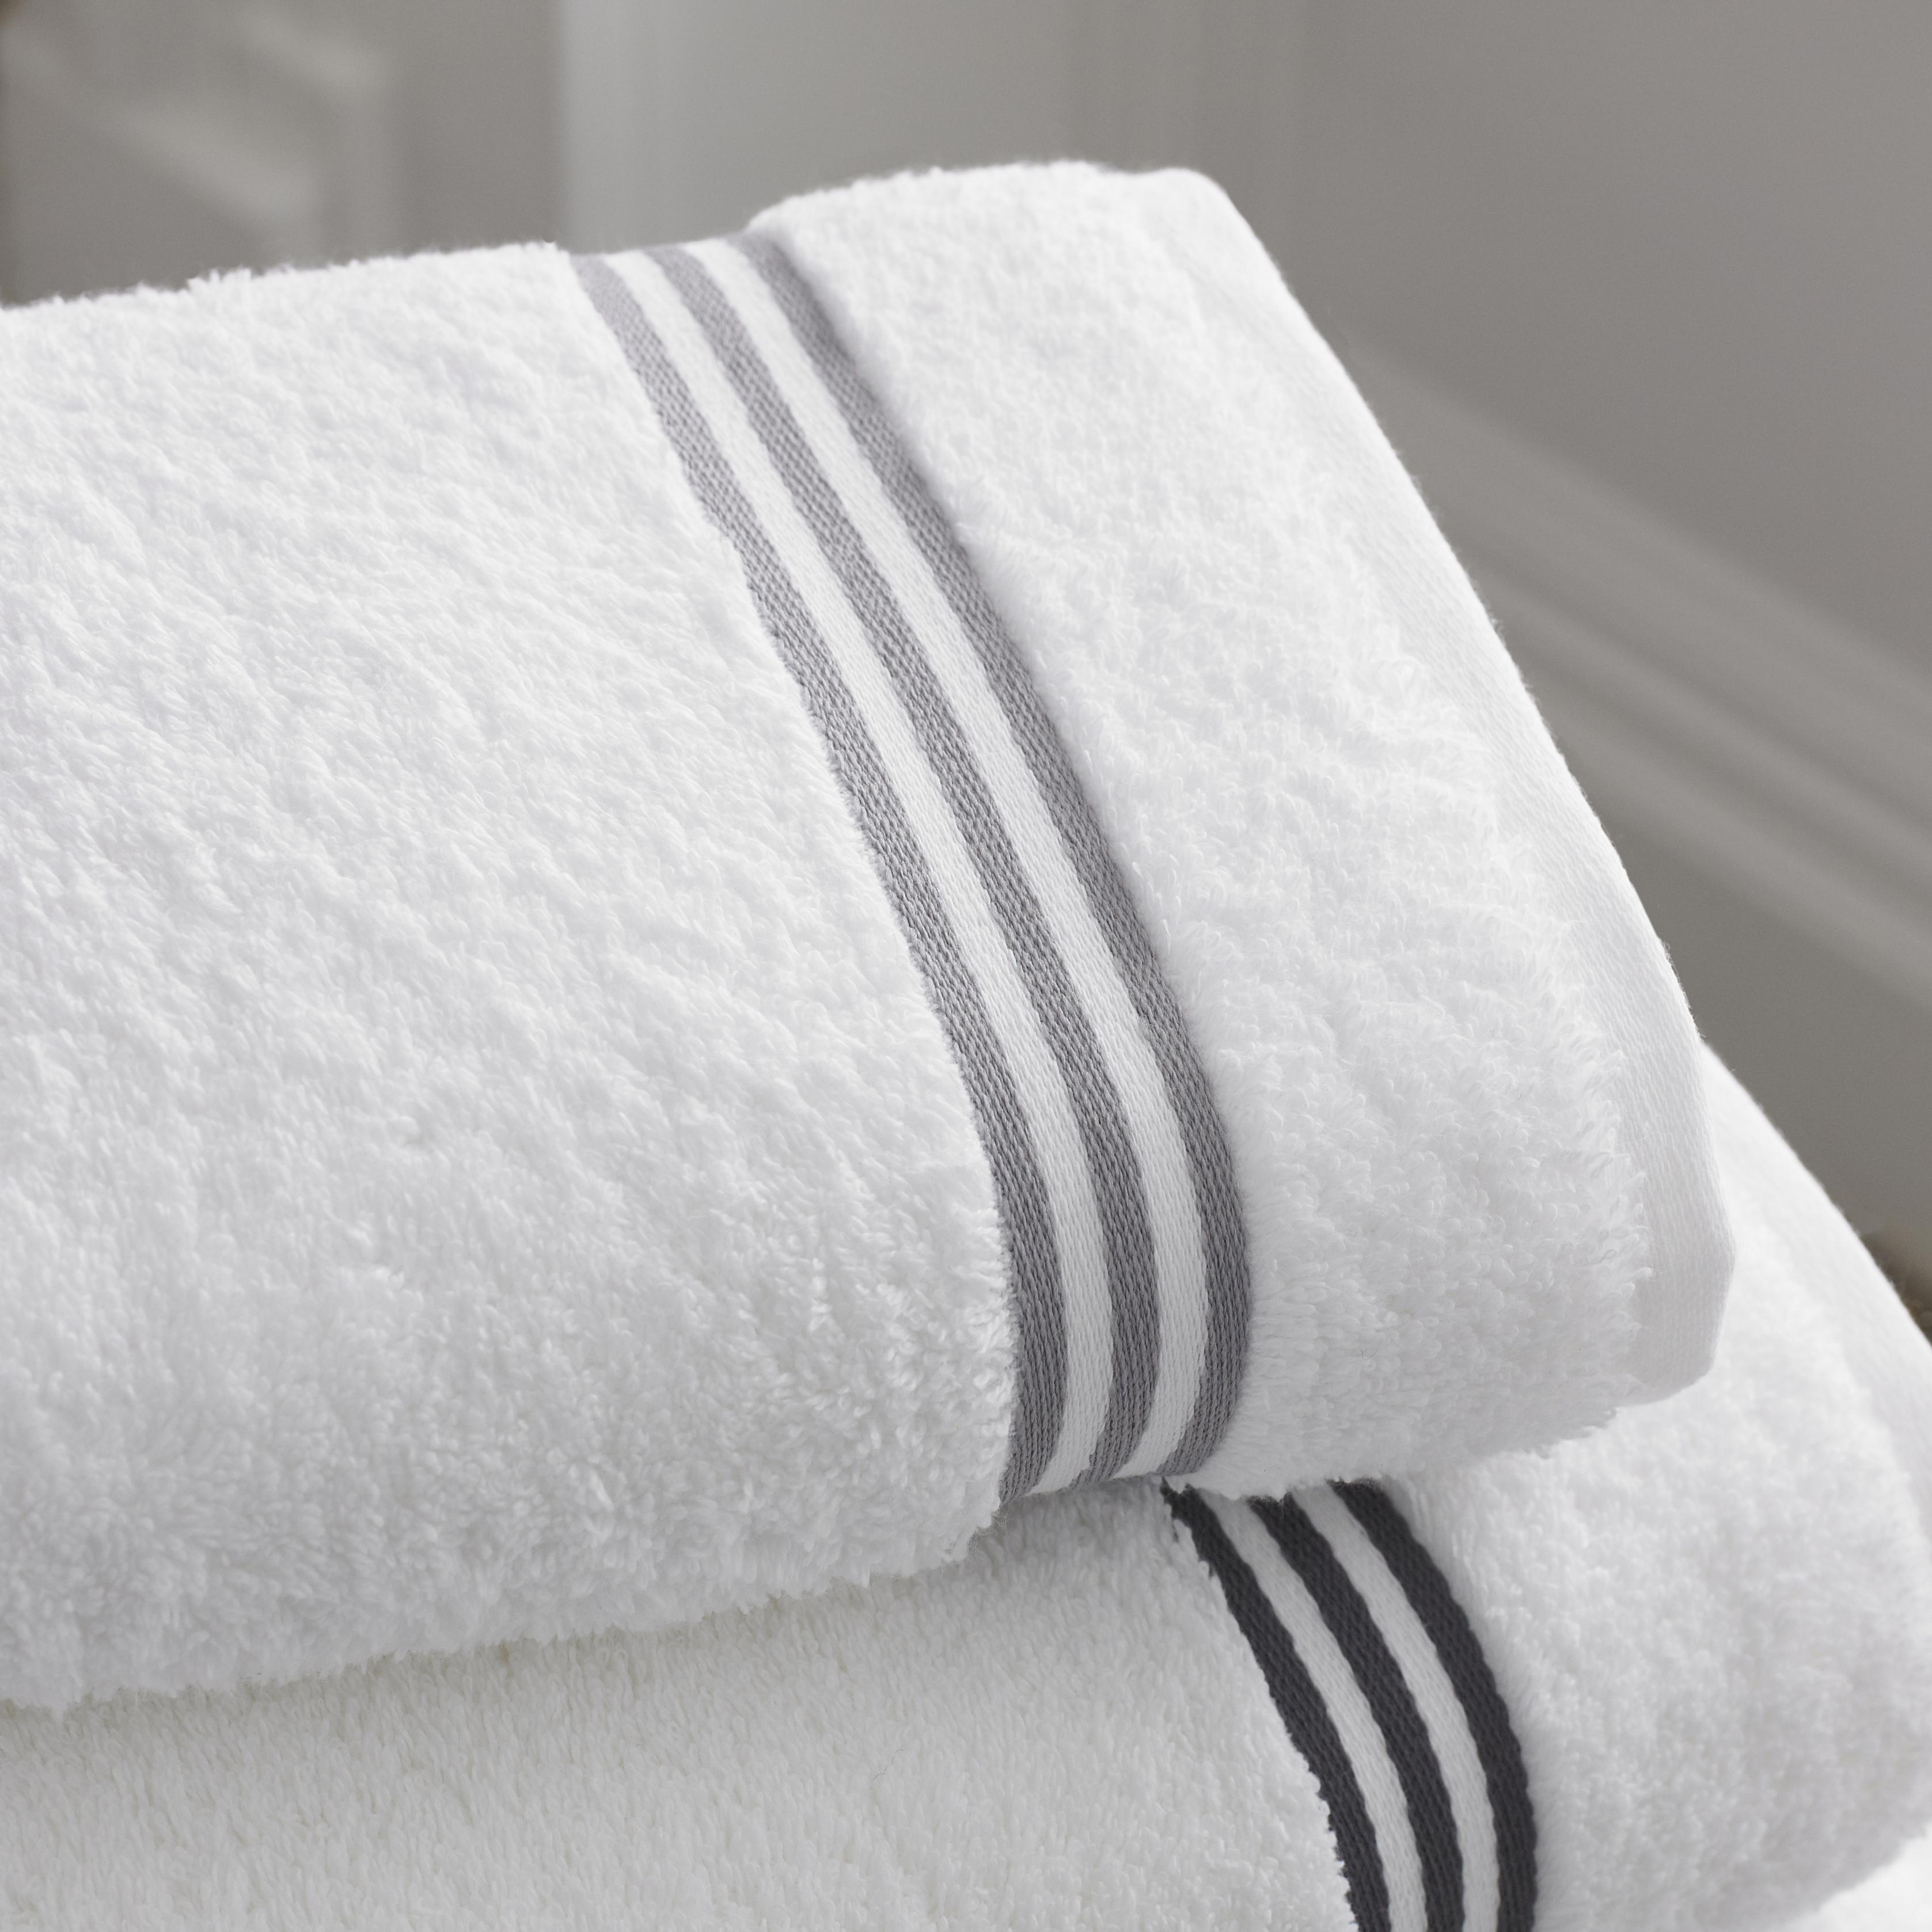 Free Stock Photo Of Bath Bathroom Towels